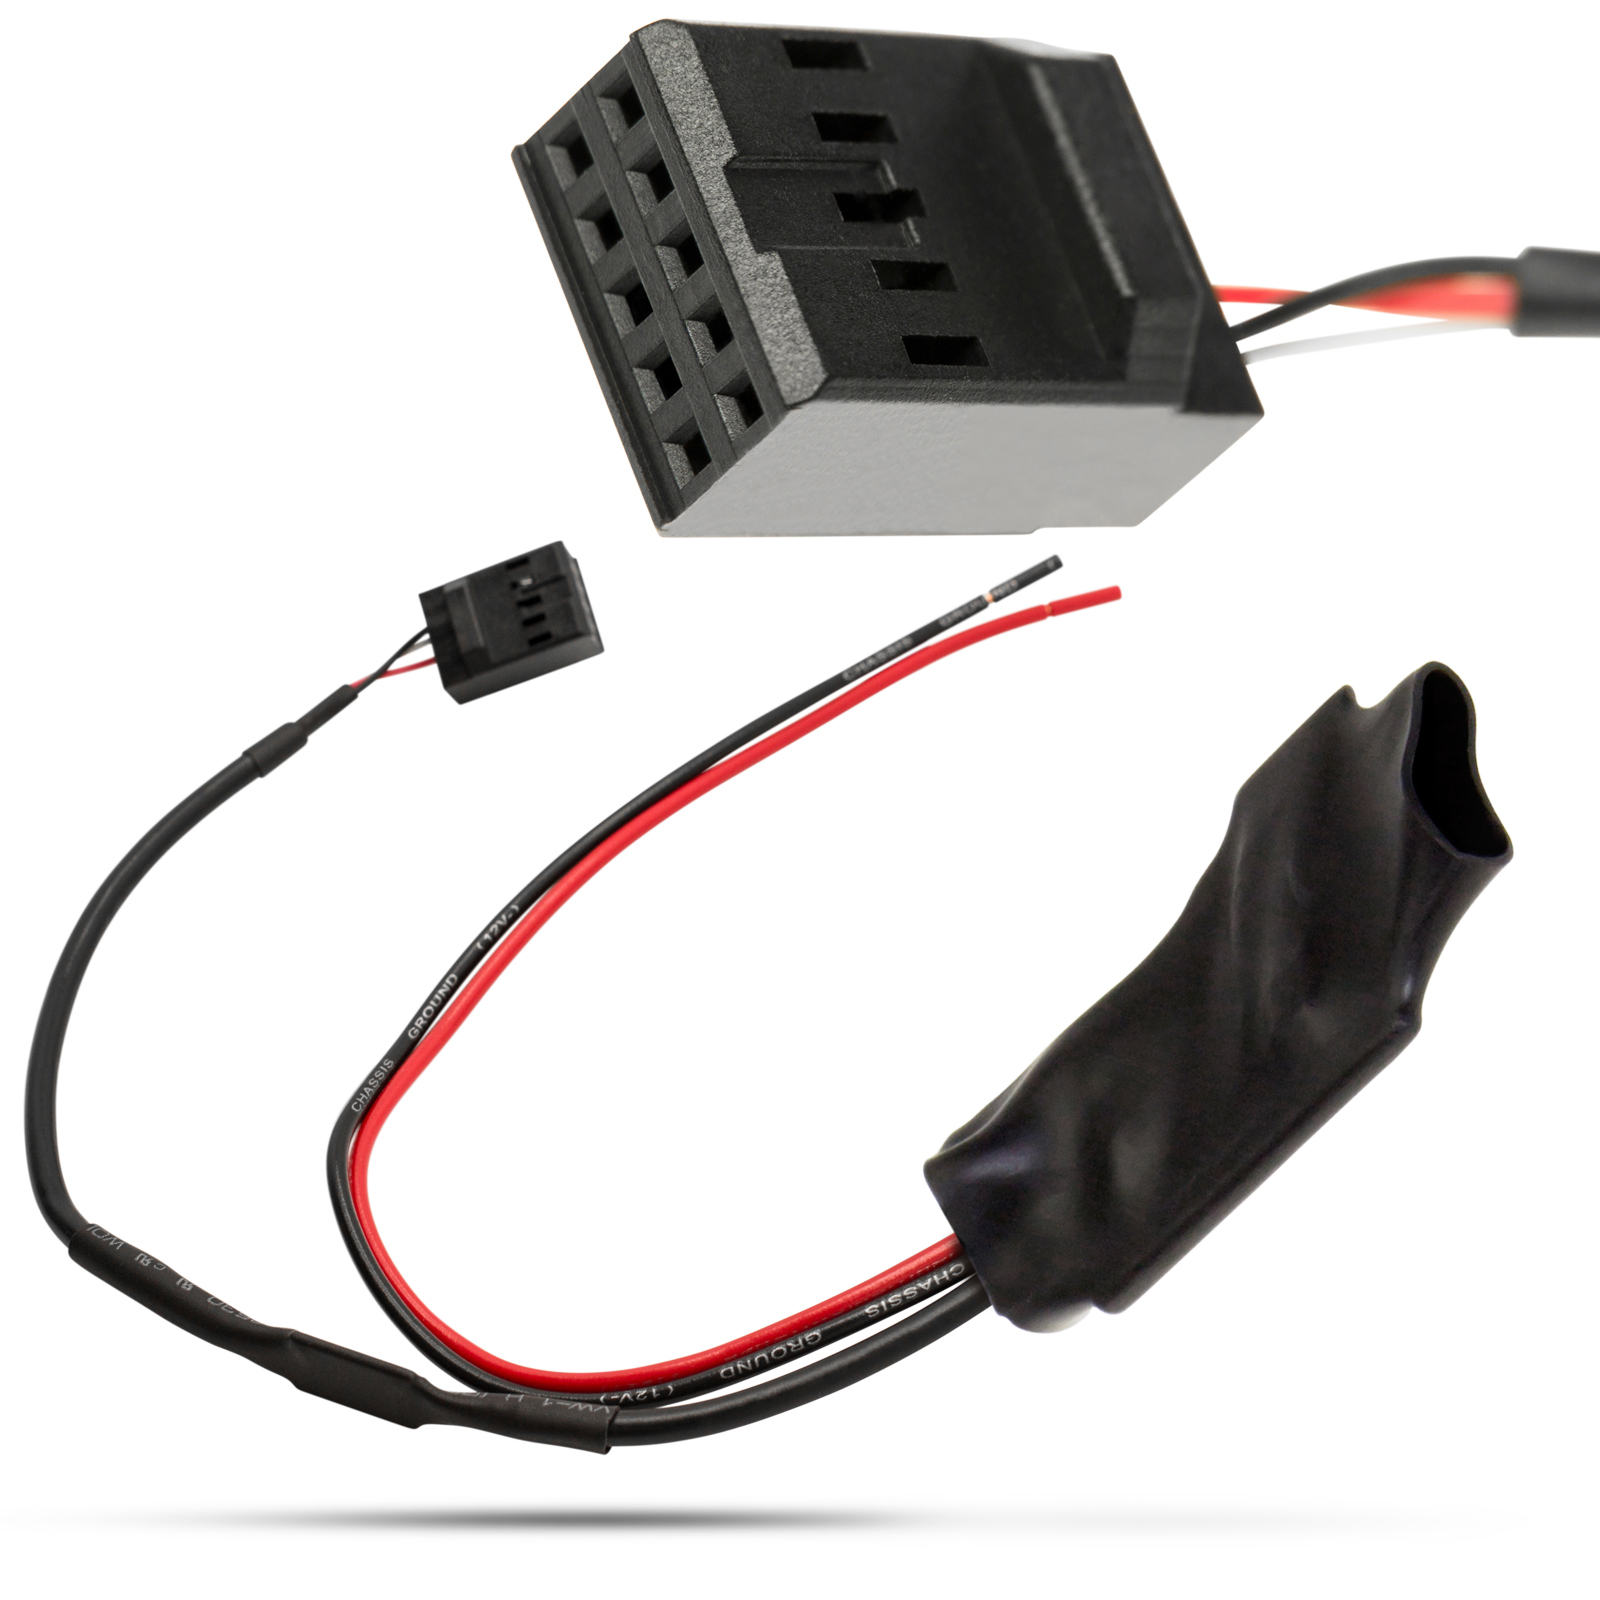 kfz auto bluetooth aux in adapter kabel verst rker. Black Bedroom Furniture Sets. Home Design Ideas